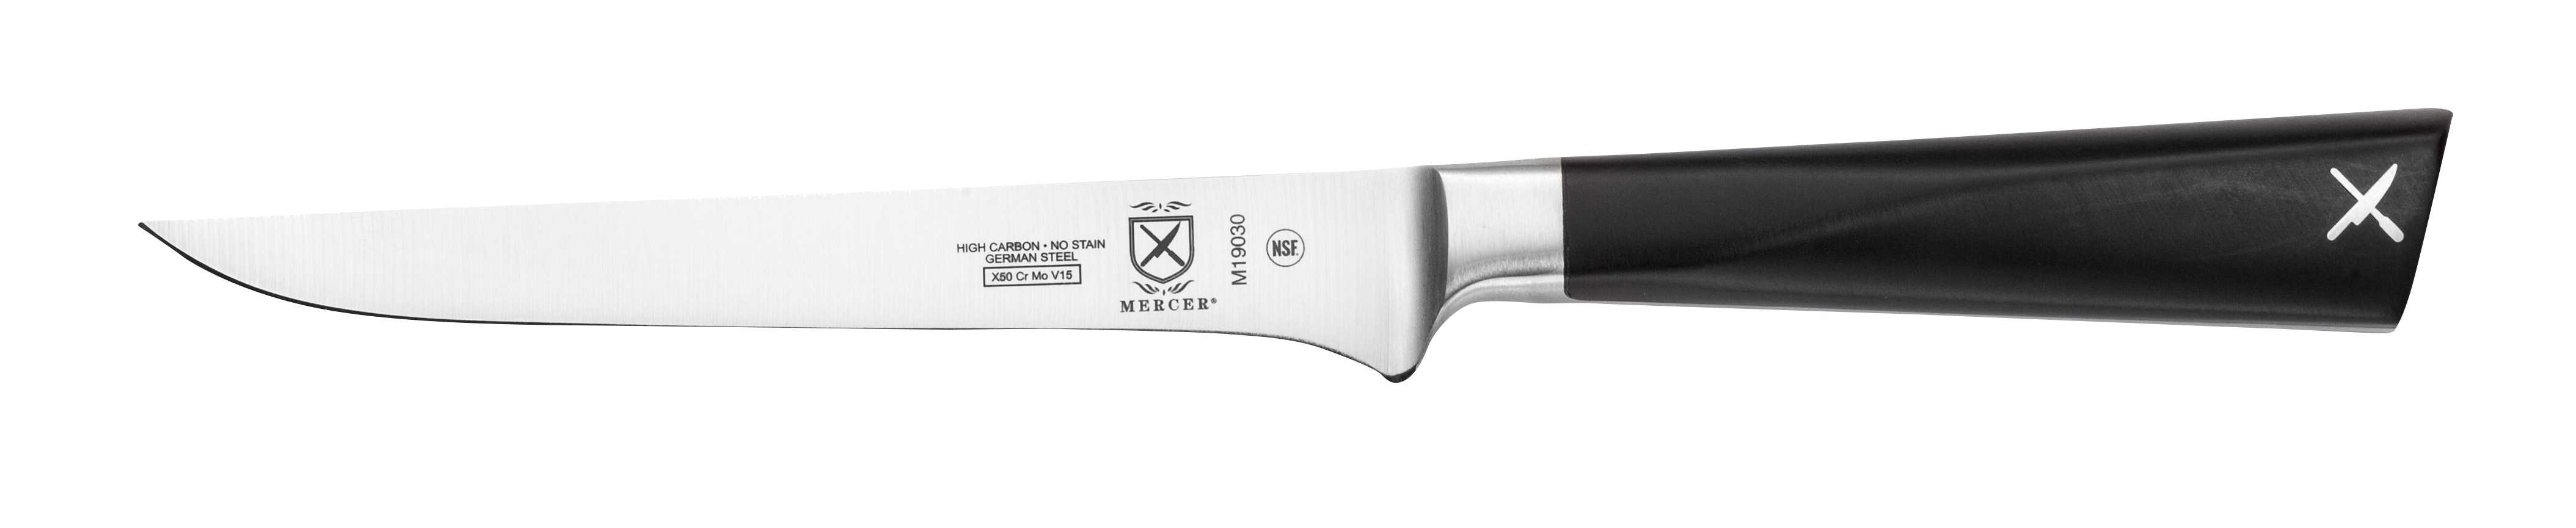 Mercer Culinary M19030 knife, boning